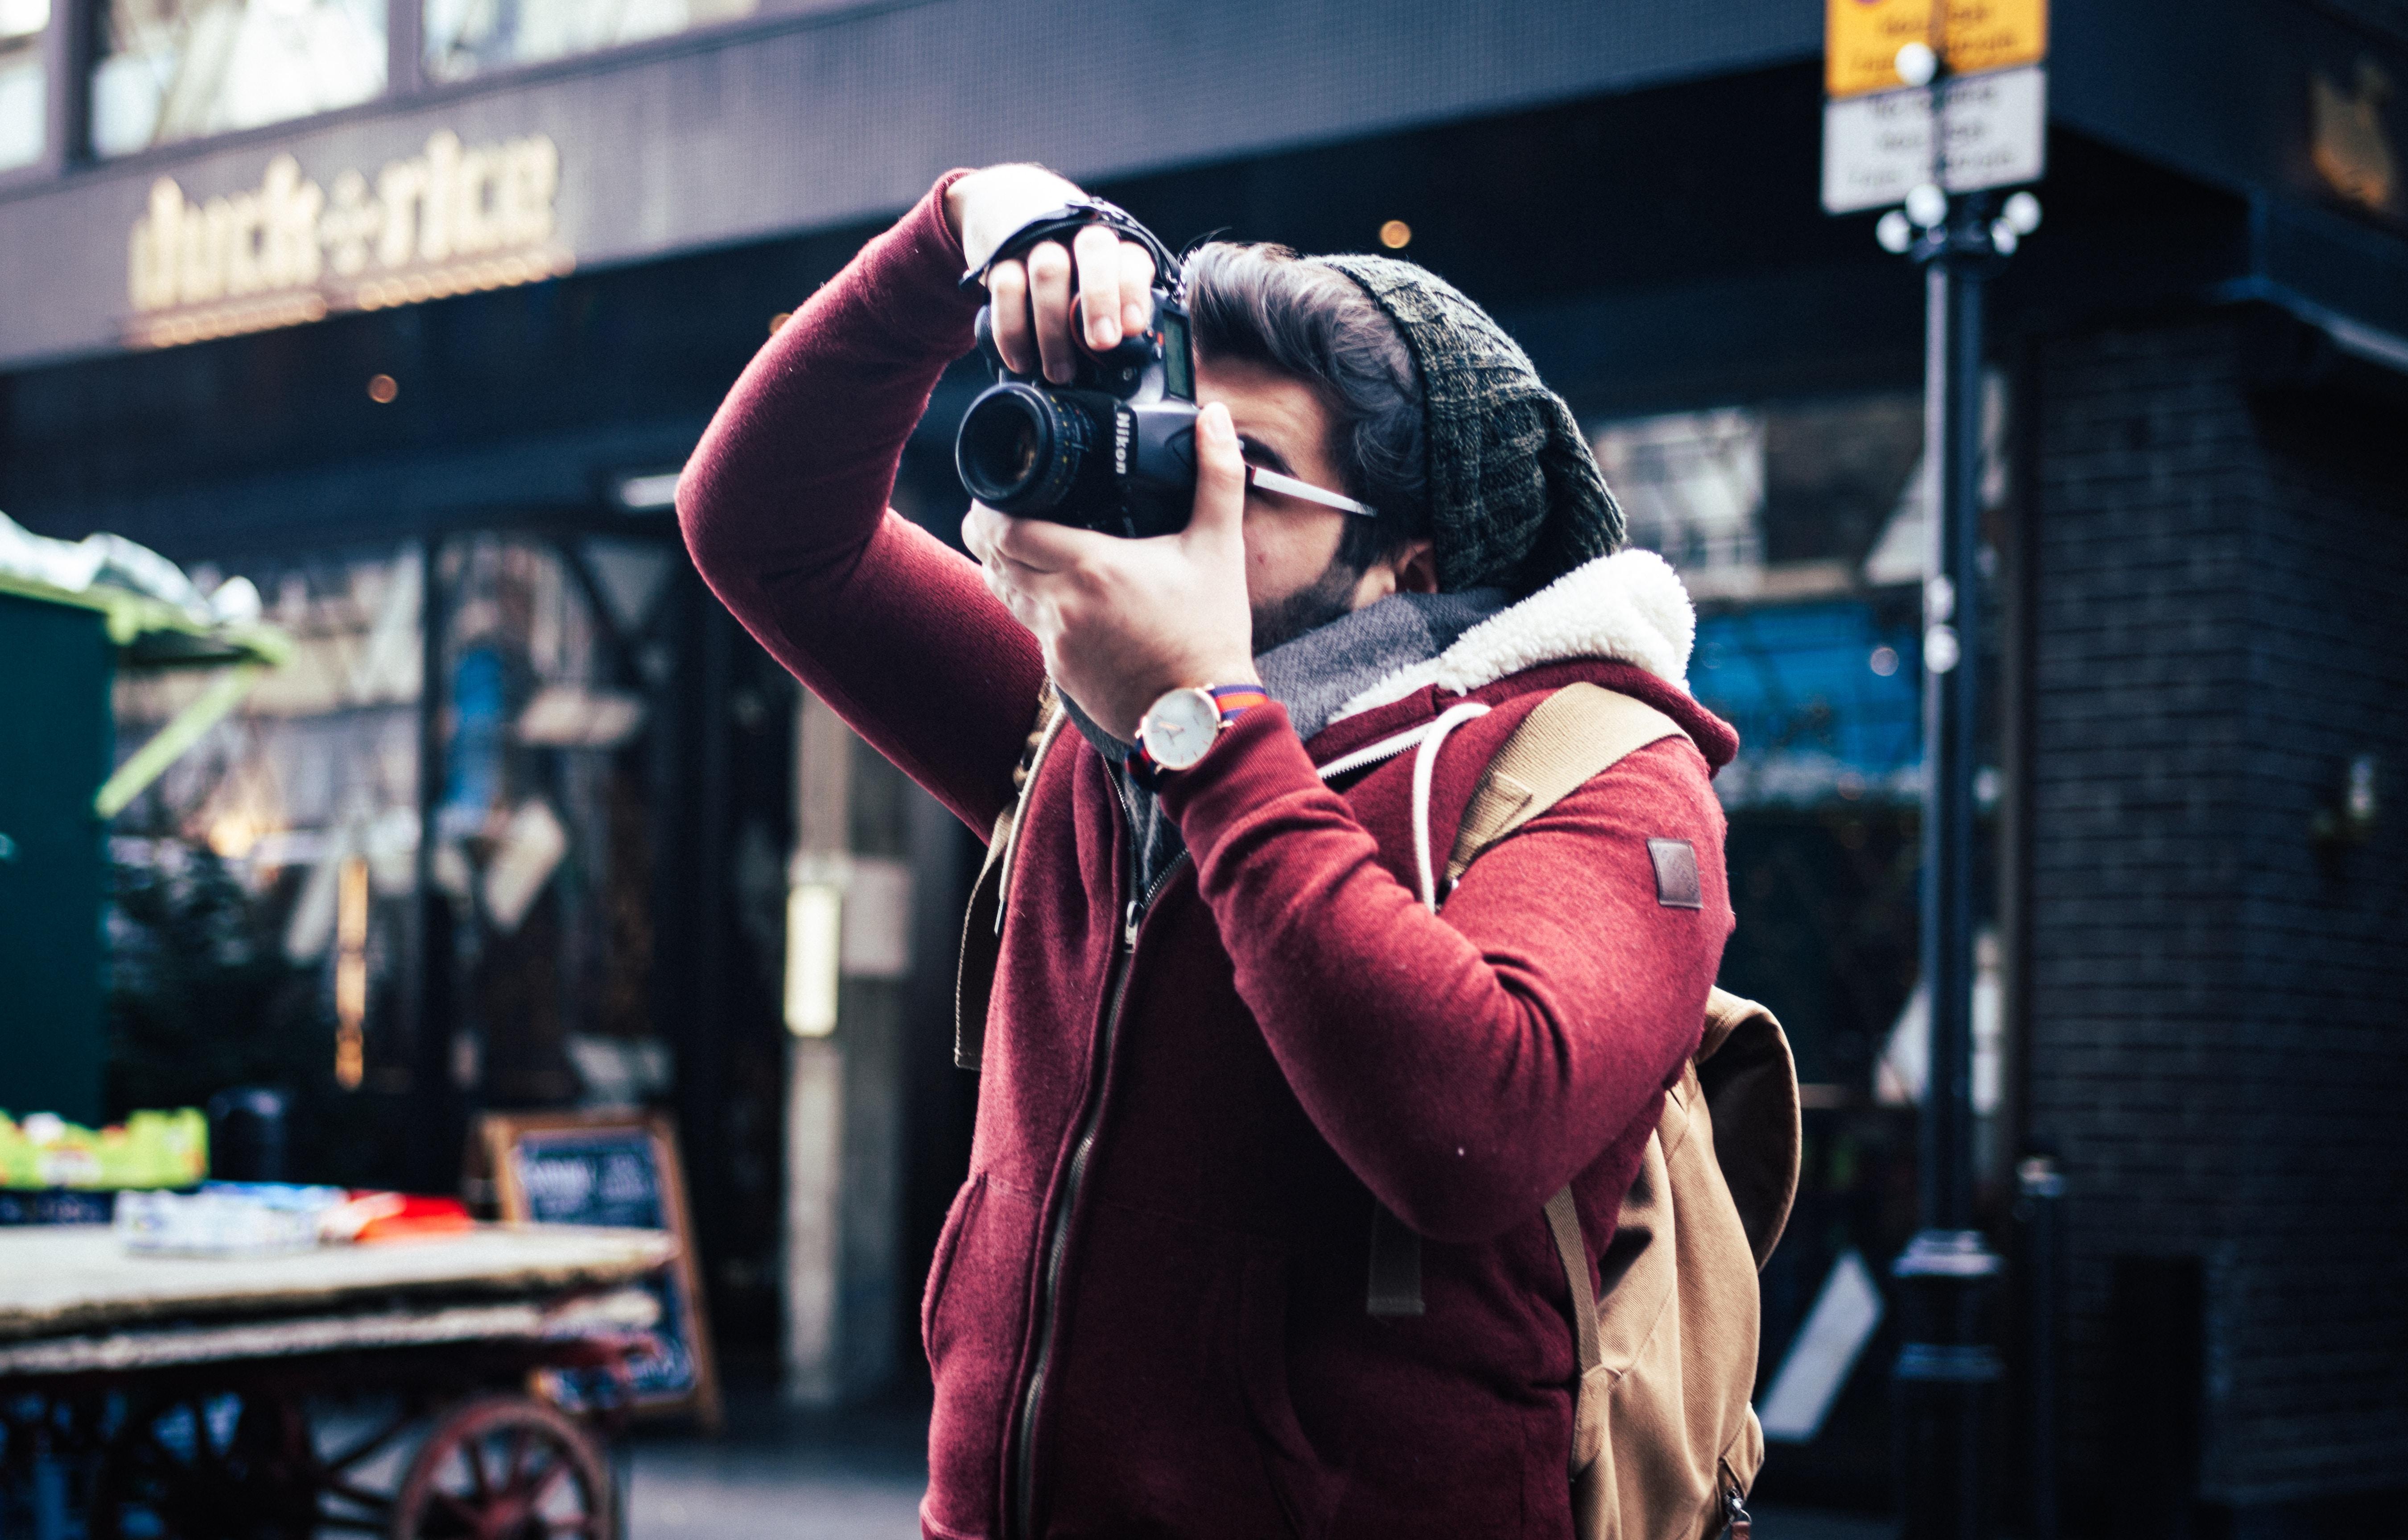 man taking a photo near storefront